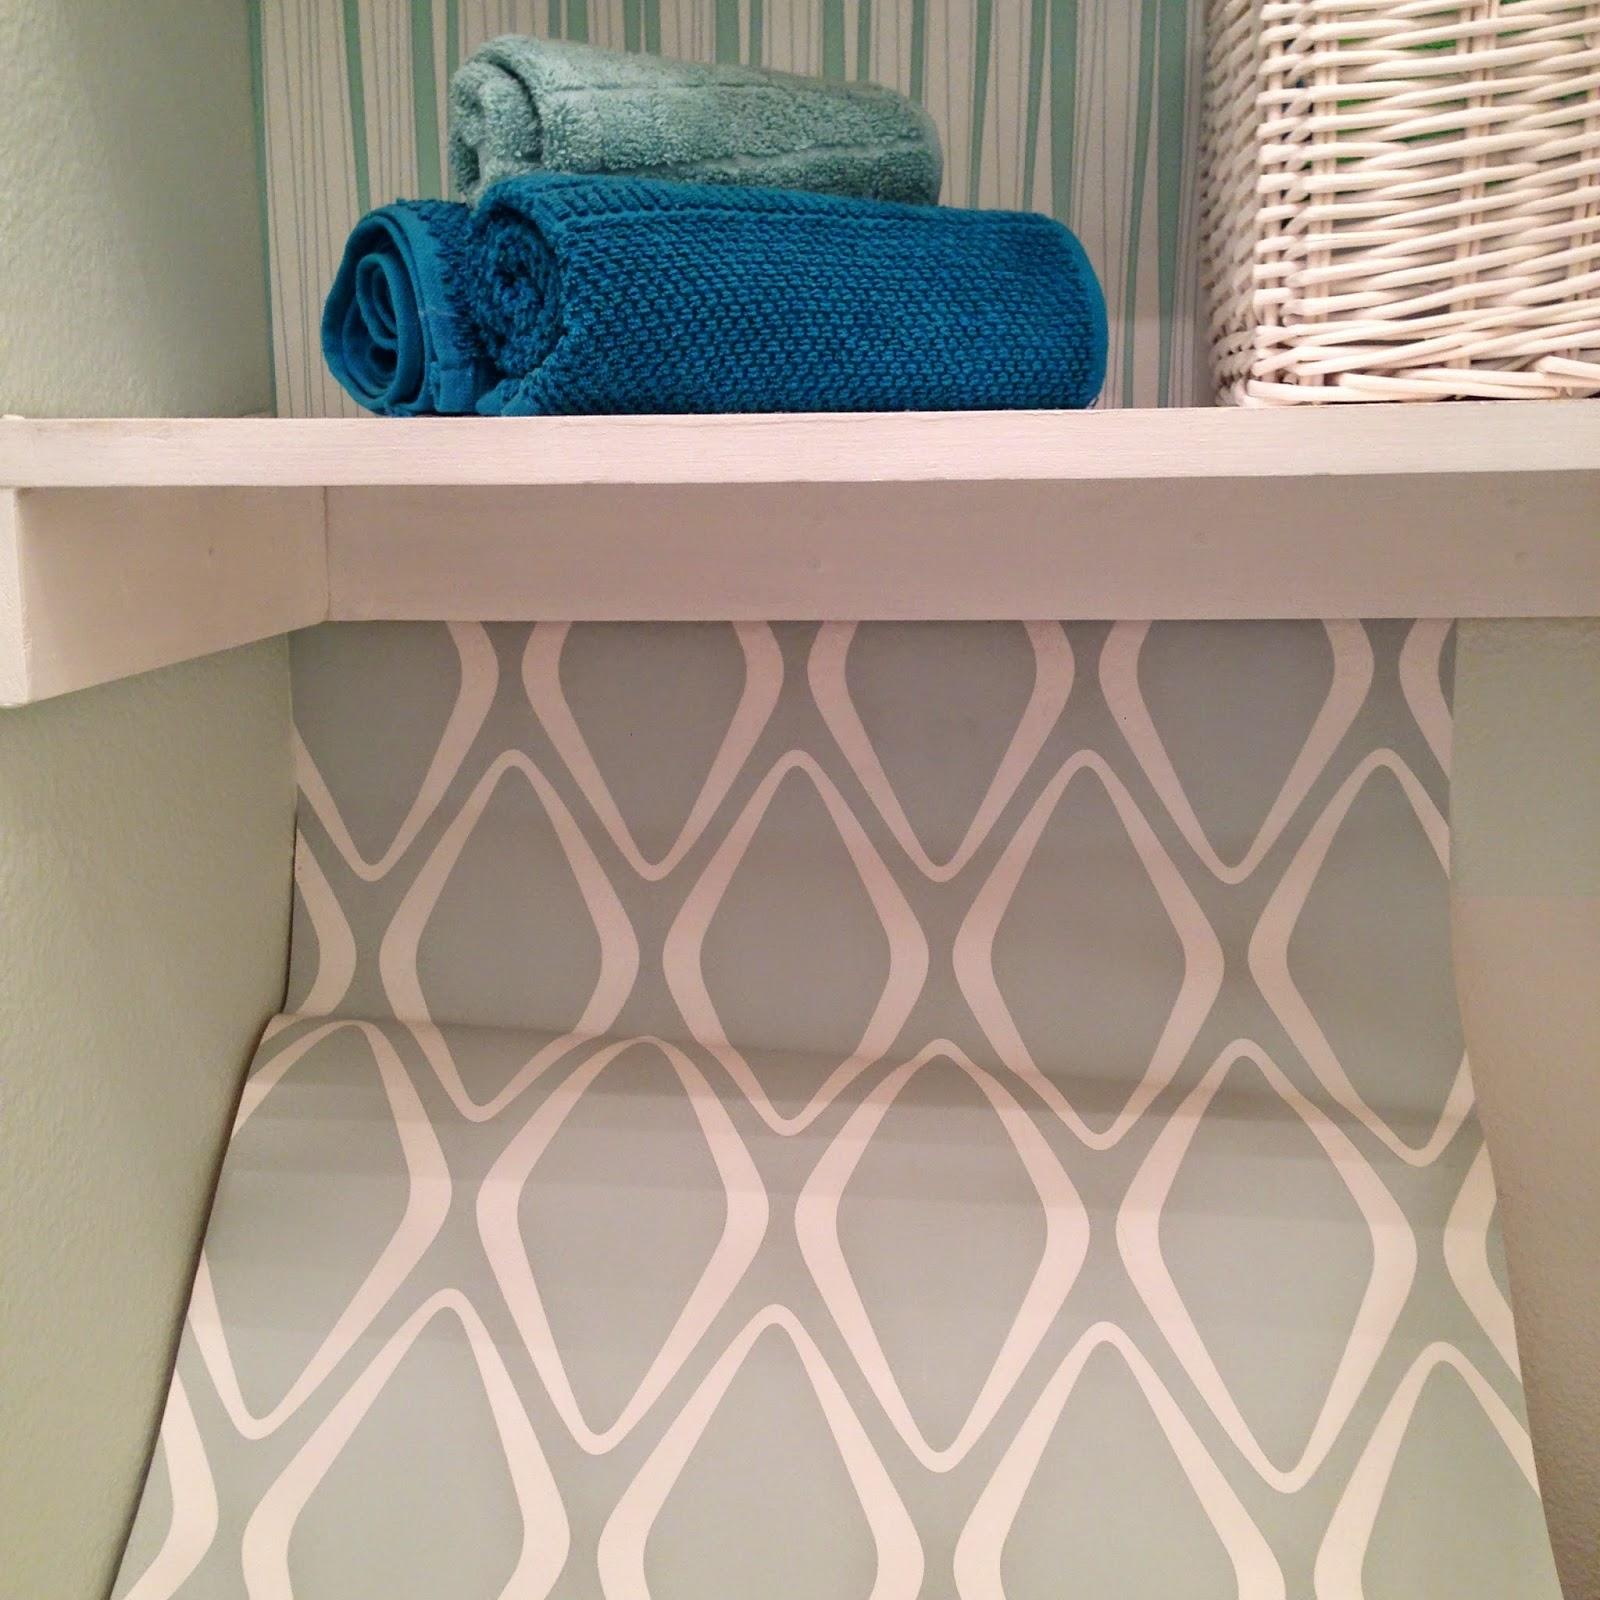 wwwfabeverydaycom Laundry Room Decor Update Devine Color Wallpaper 1600x1600